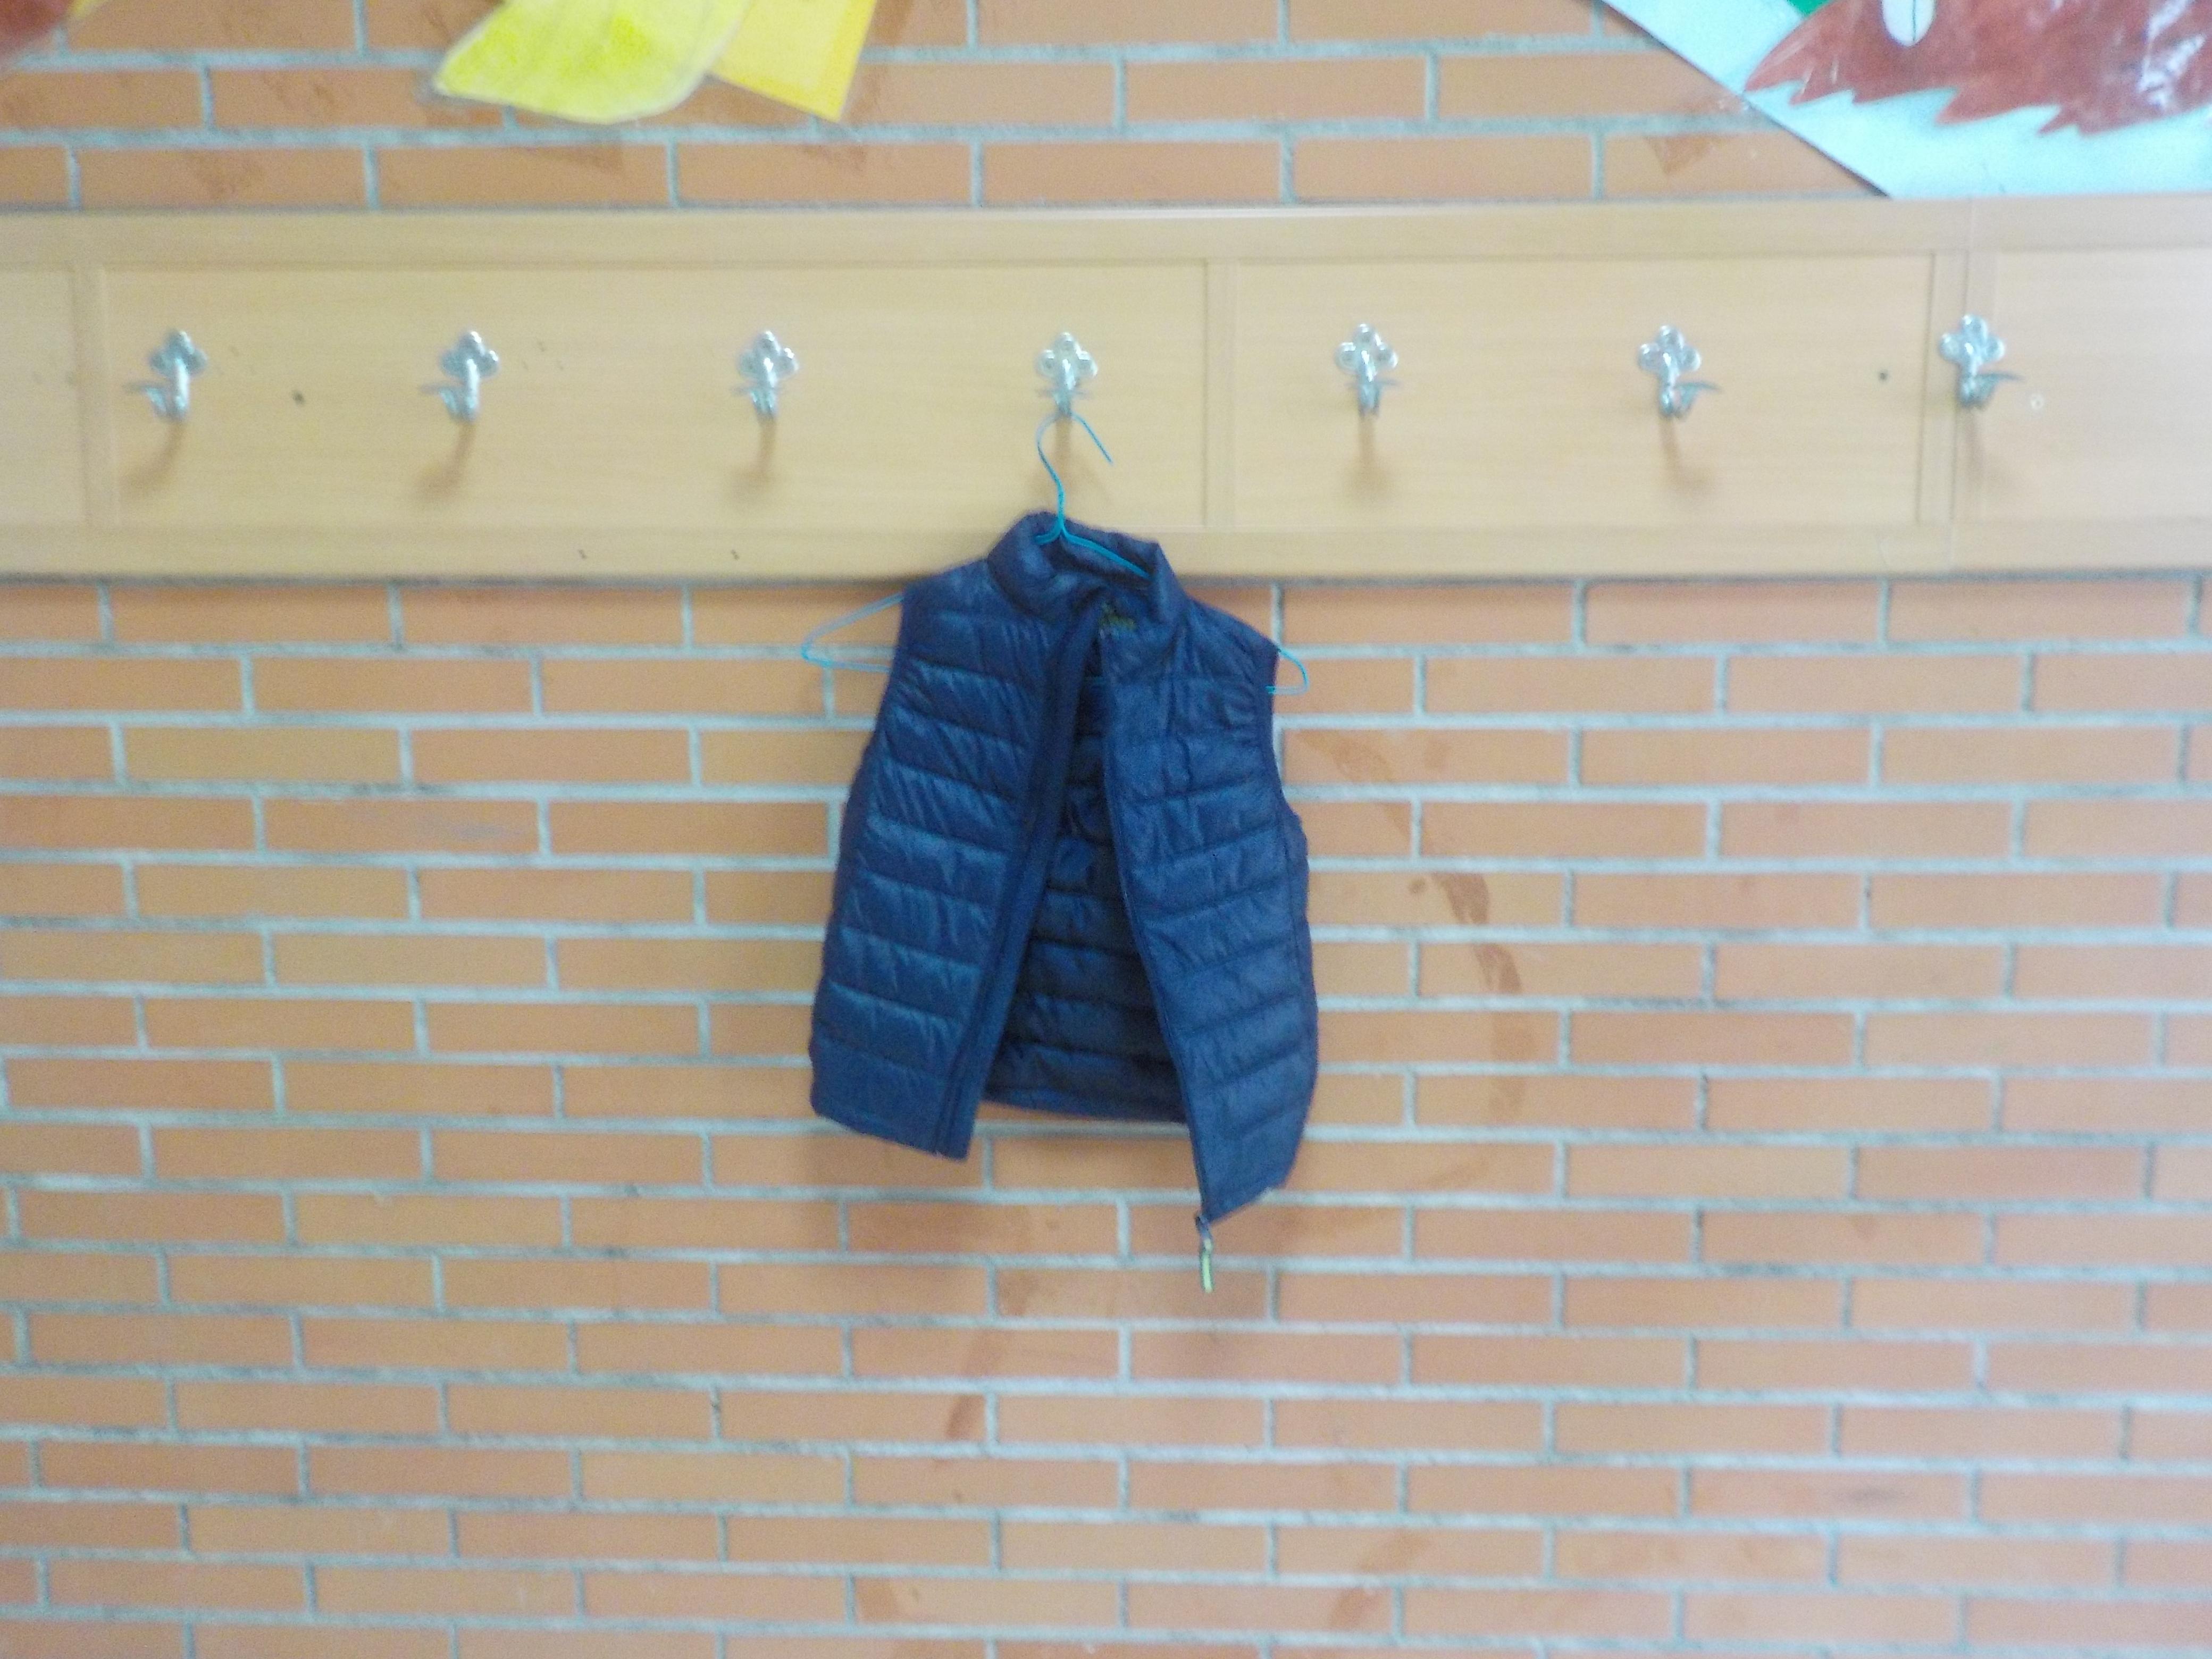 Catalogo de ropa olvidada 1  2018 5